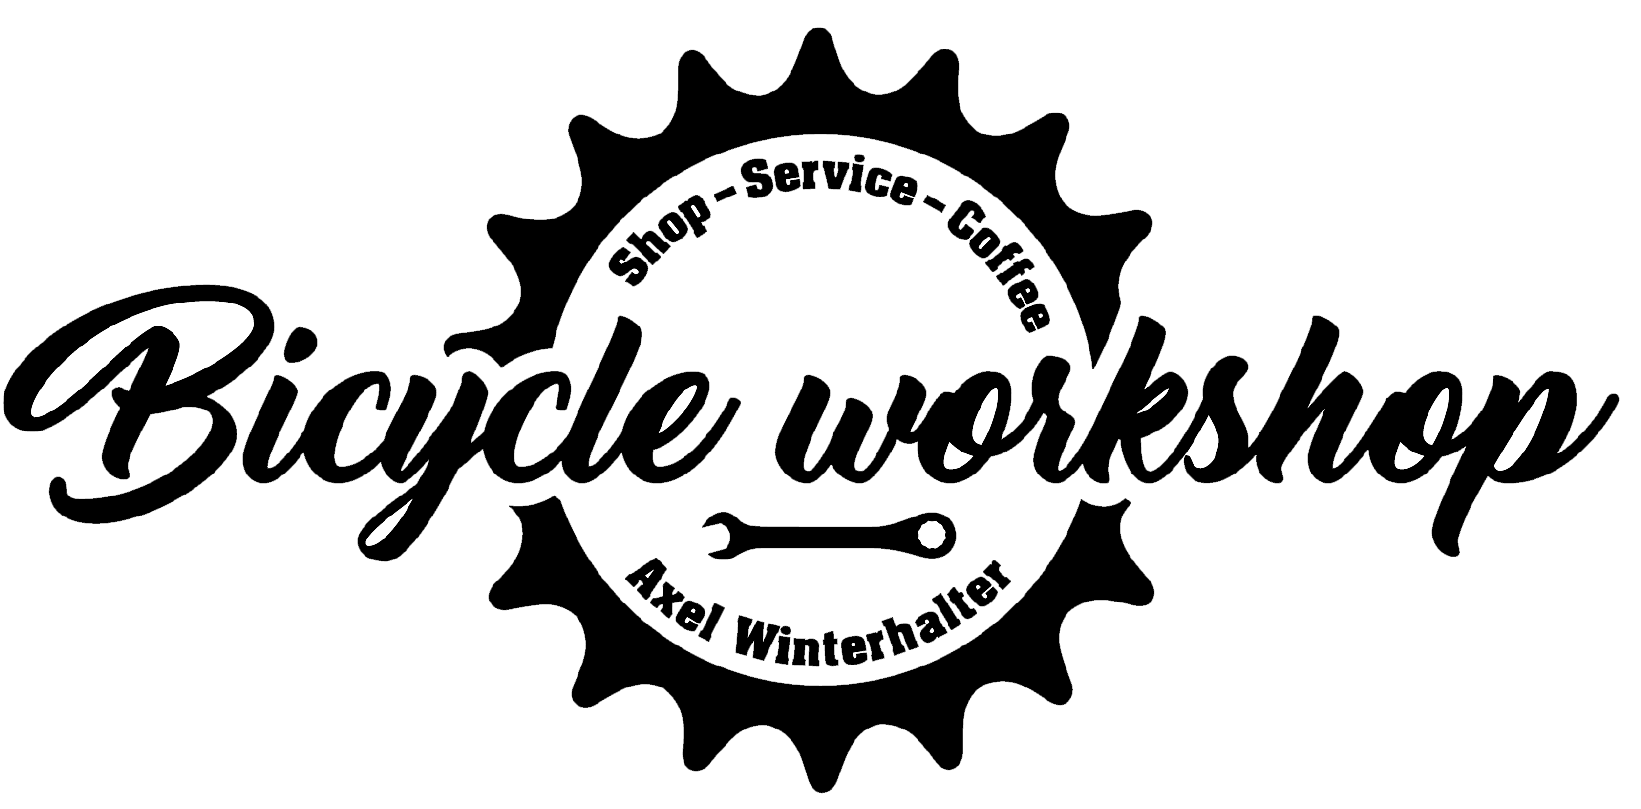 Bicycle workshop logo transparent big